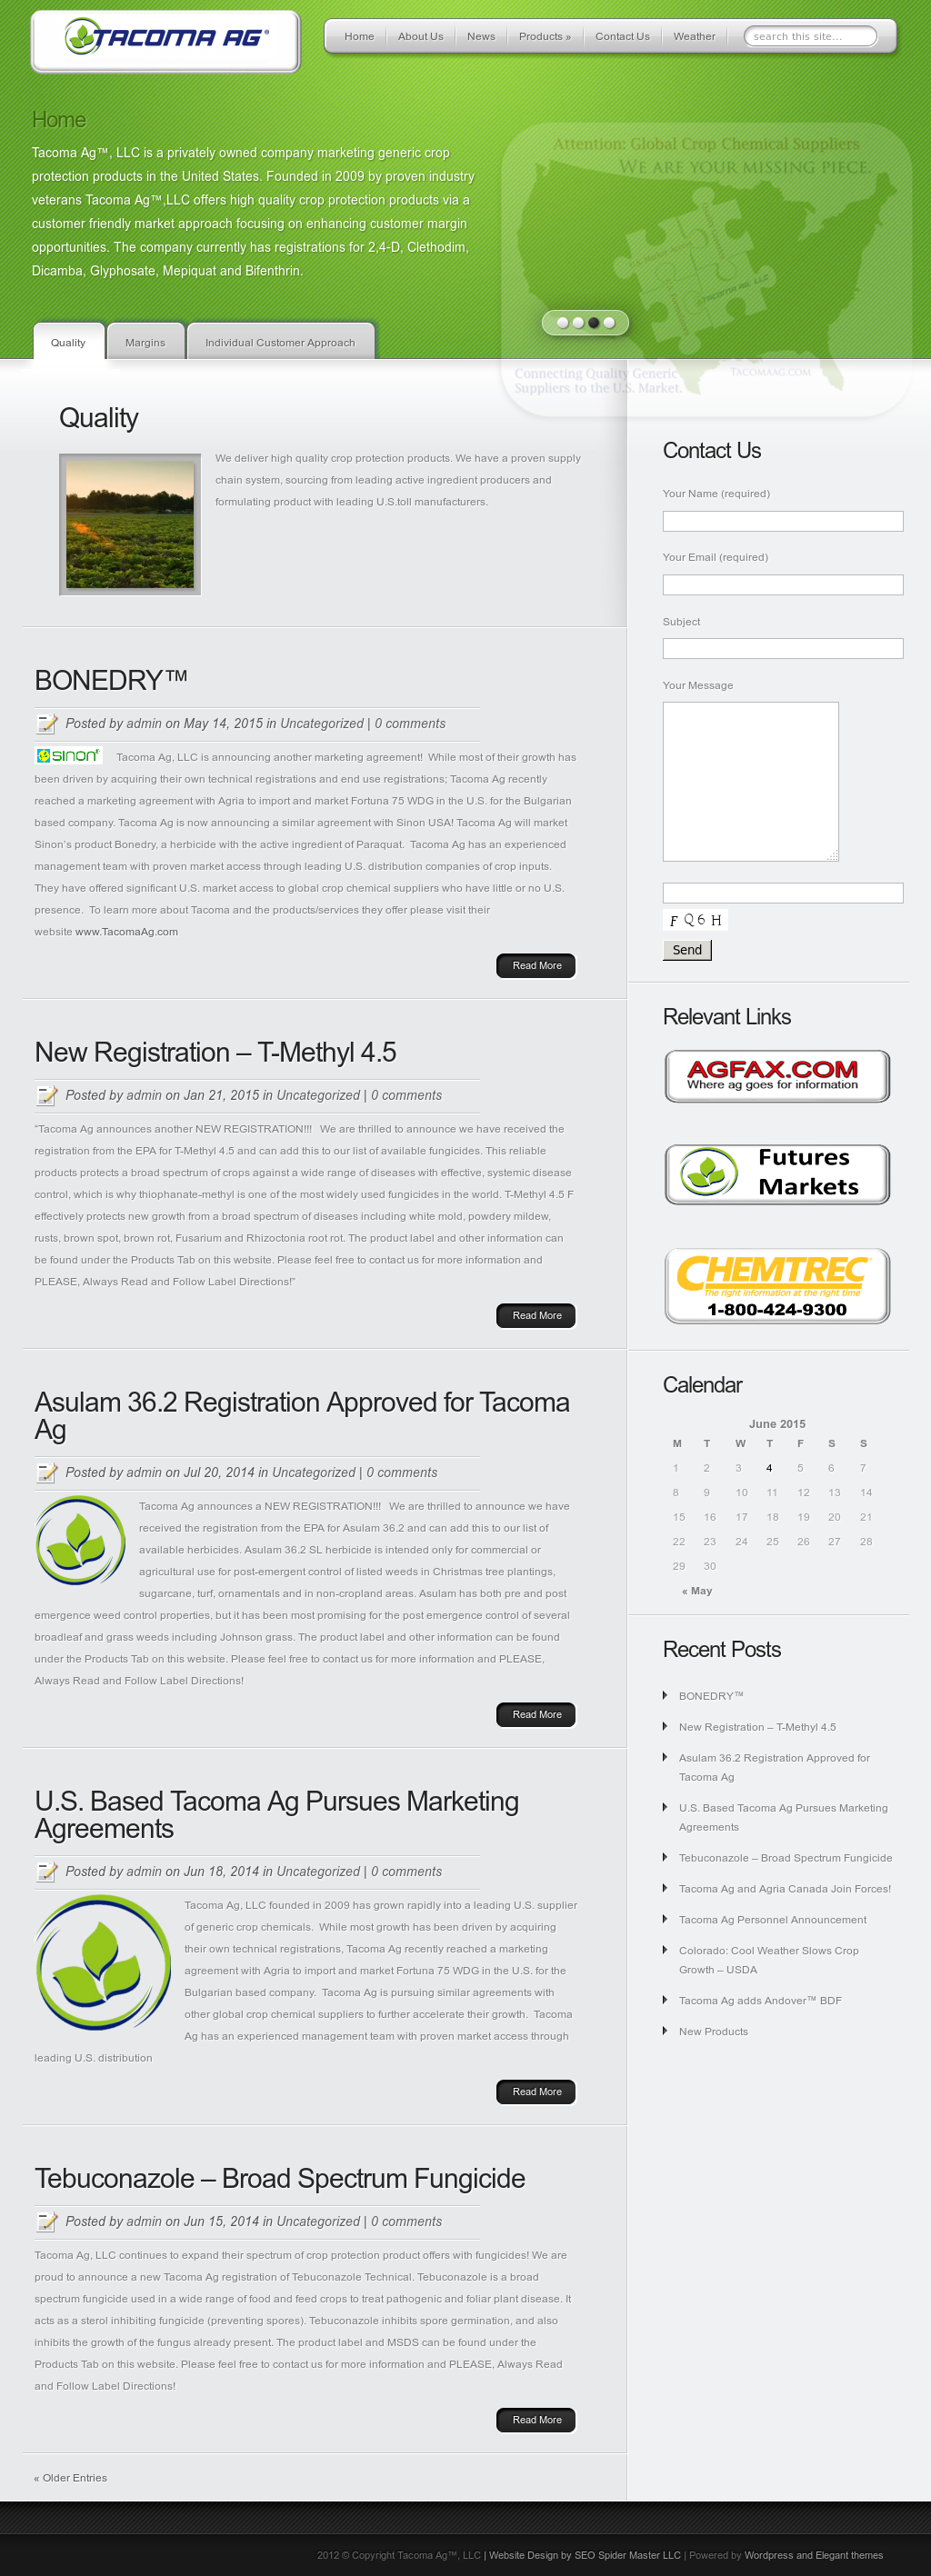 Tacoma Ag Competitors, Revenue and Employees - Owler Company Profile